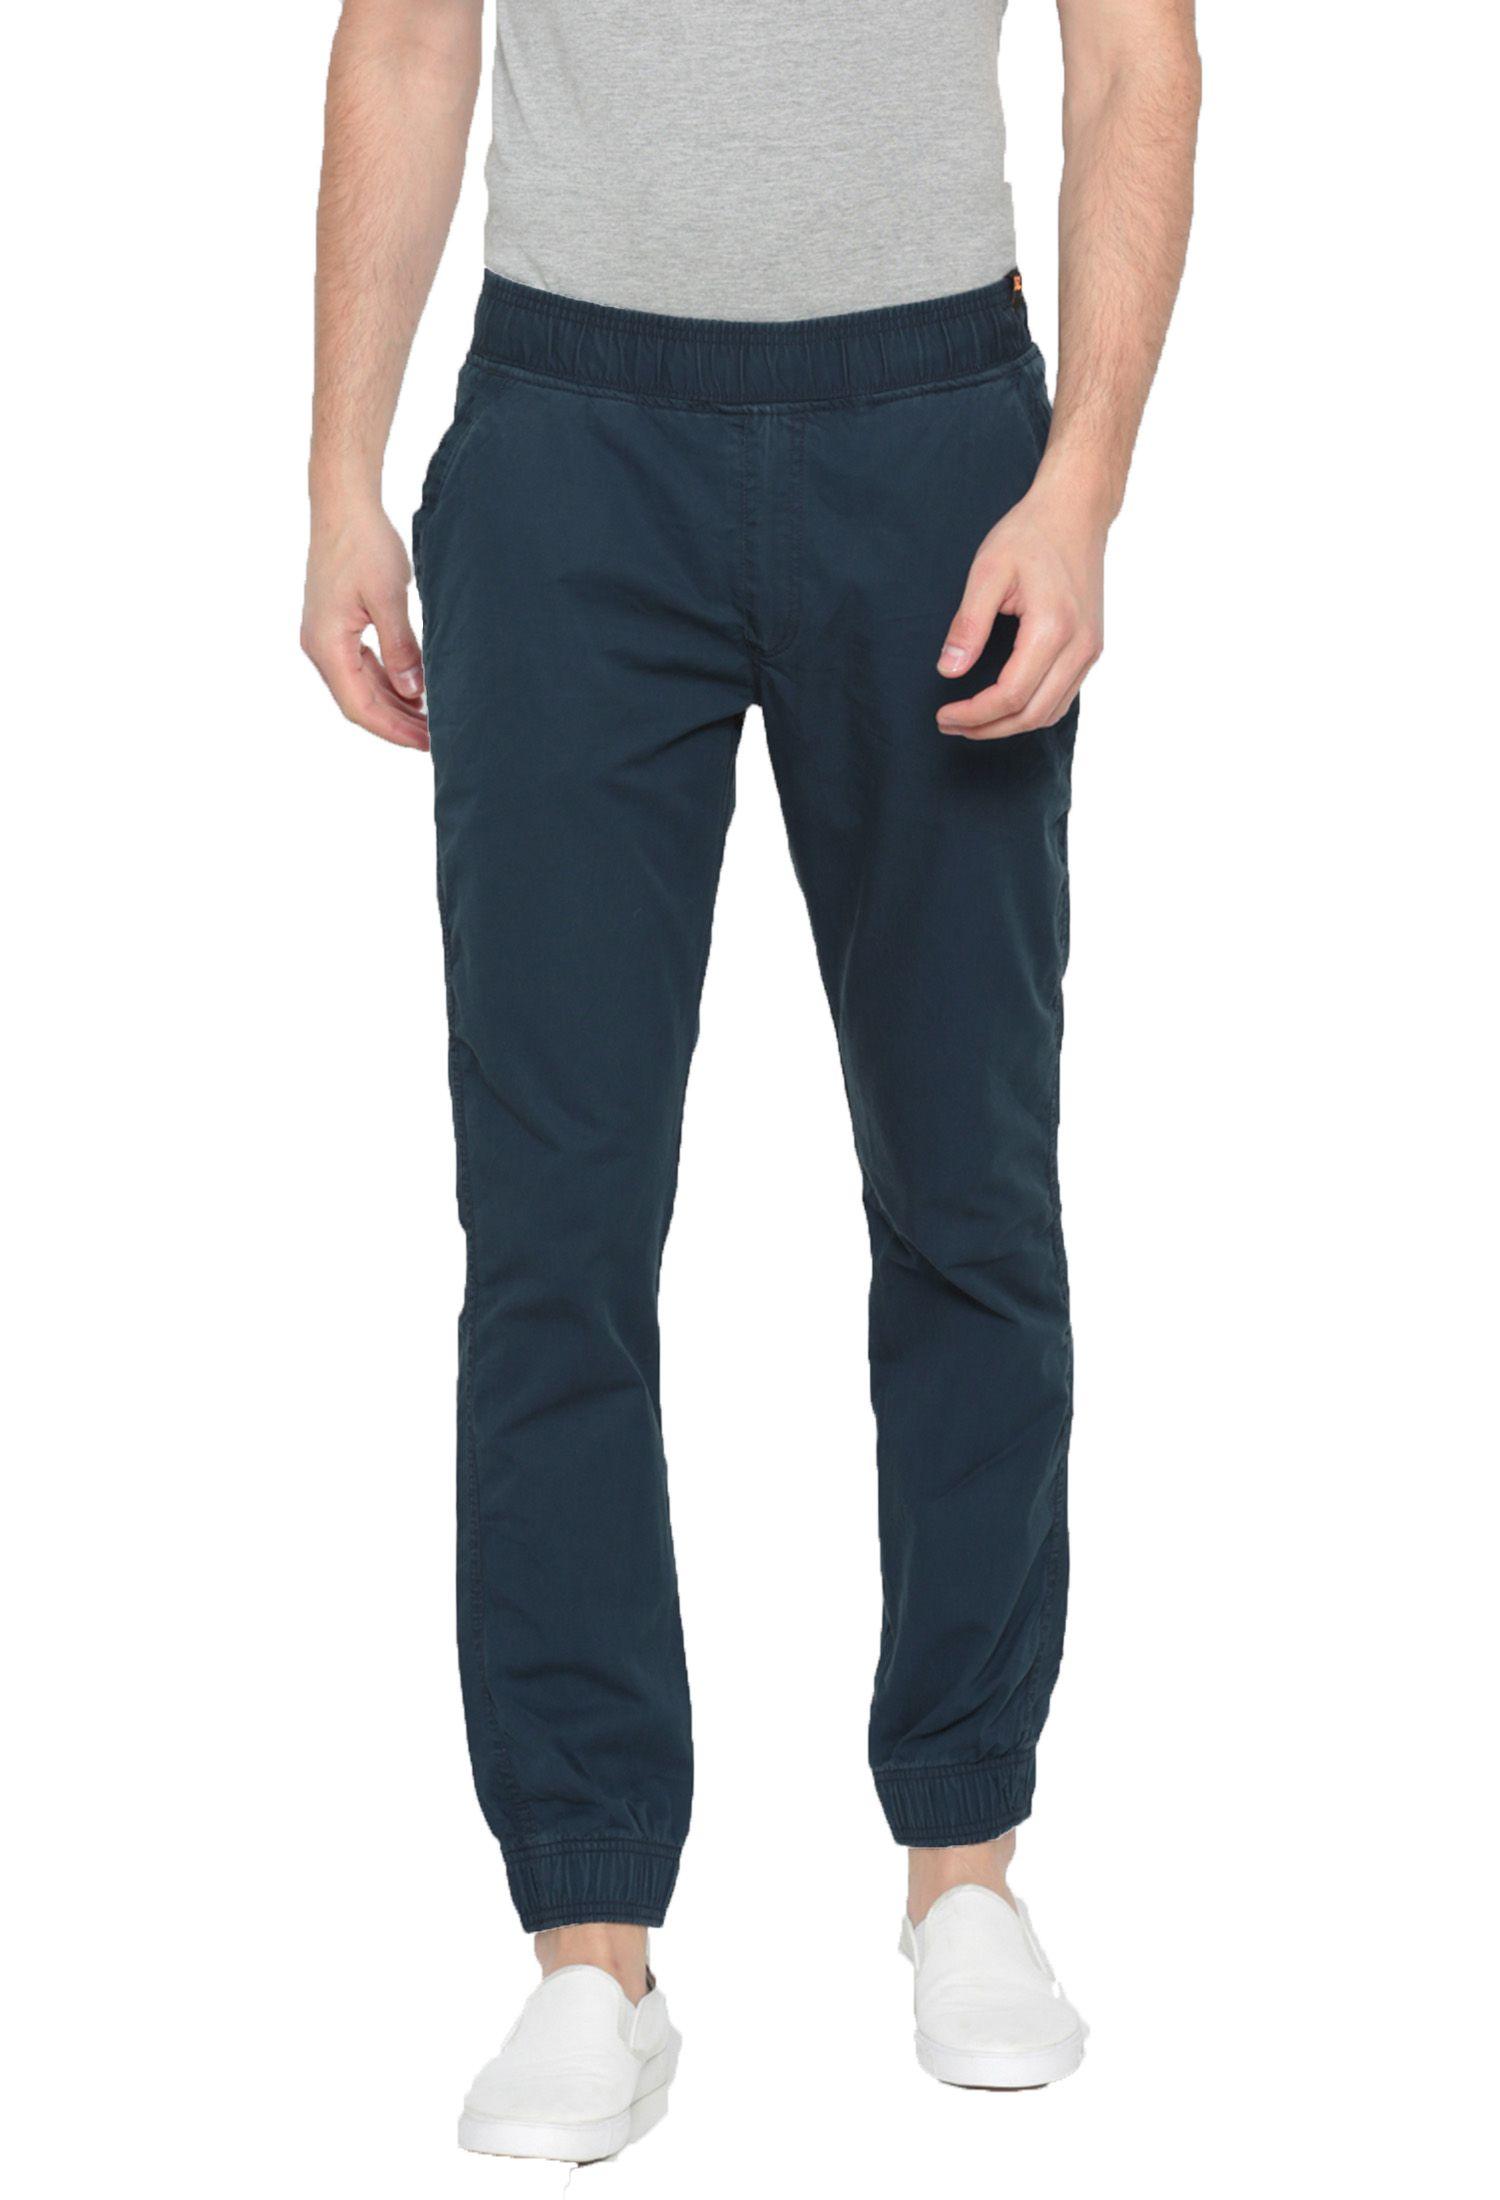 Sports 52 Wear Navy Blue Slim -Fit Flat Joggers